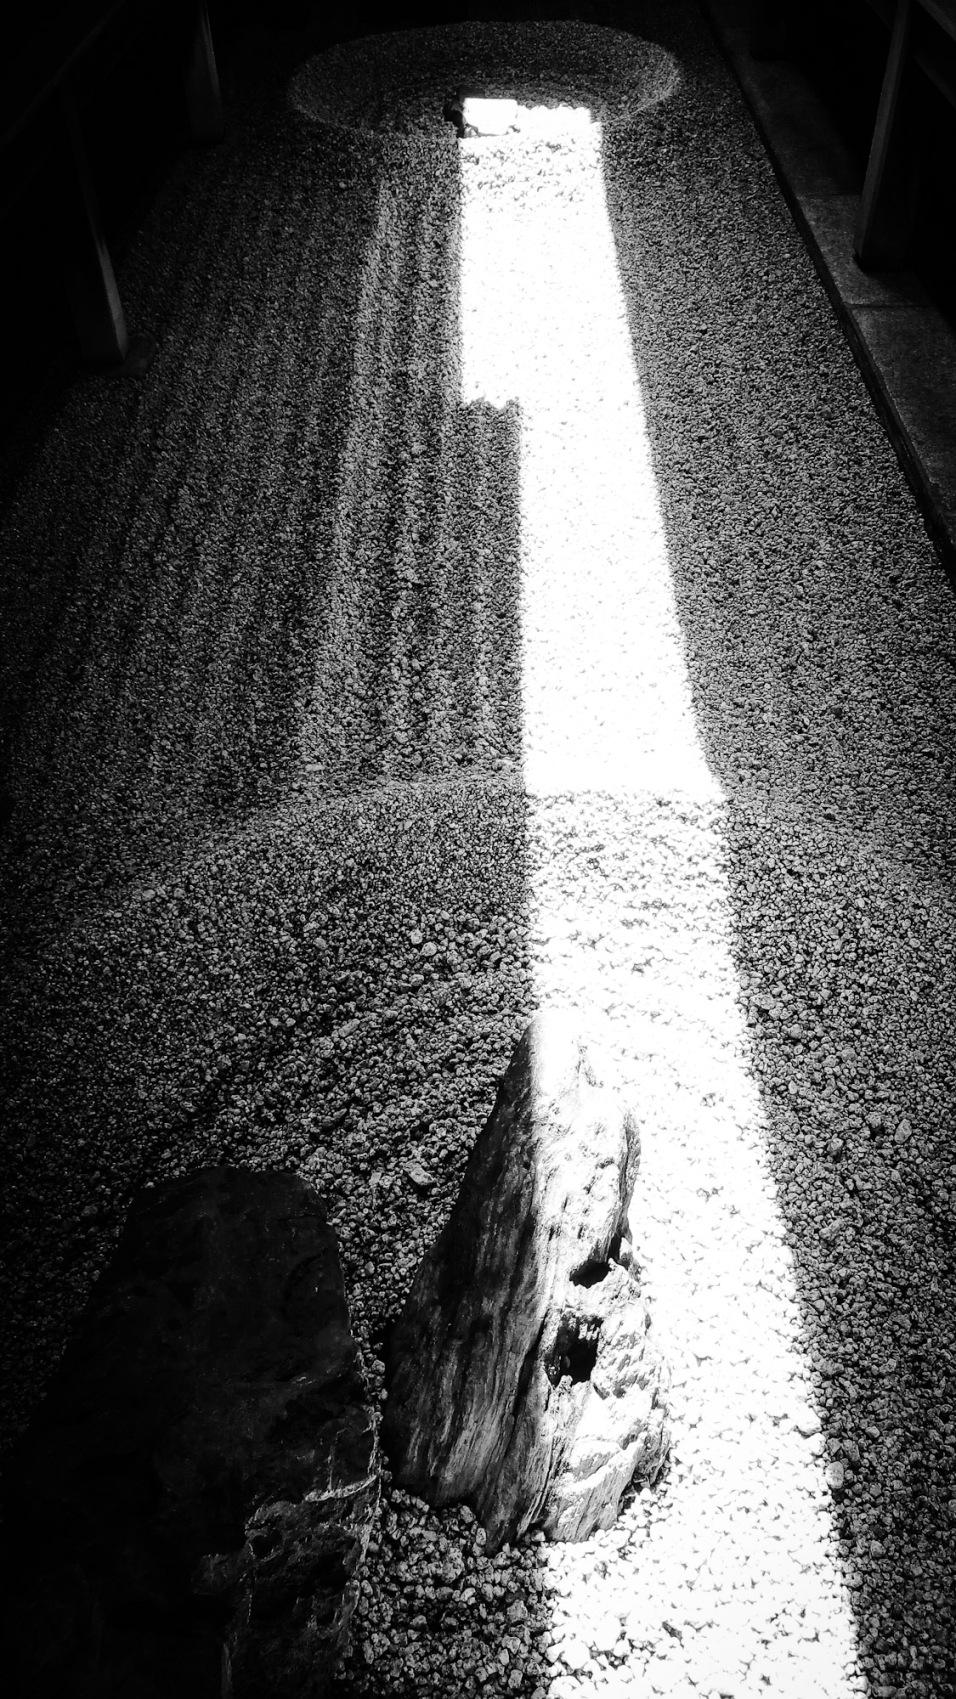 Urban photos – Murasakino, Kyoto, Japan. 'Ryogen-in Temple,1.' Image from my latest travel art blog article 'Sakura Japan.' Now online - sketchbookexplorer.com @davidasutton @sketchbookexplorer Facebook.com/davidanthonysutton #photography #japan #Kyoto #Ryogenintemple #zengarden #meditation #travel #travelblog #cherryblossom #cherryblossomseason